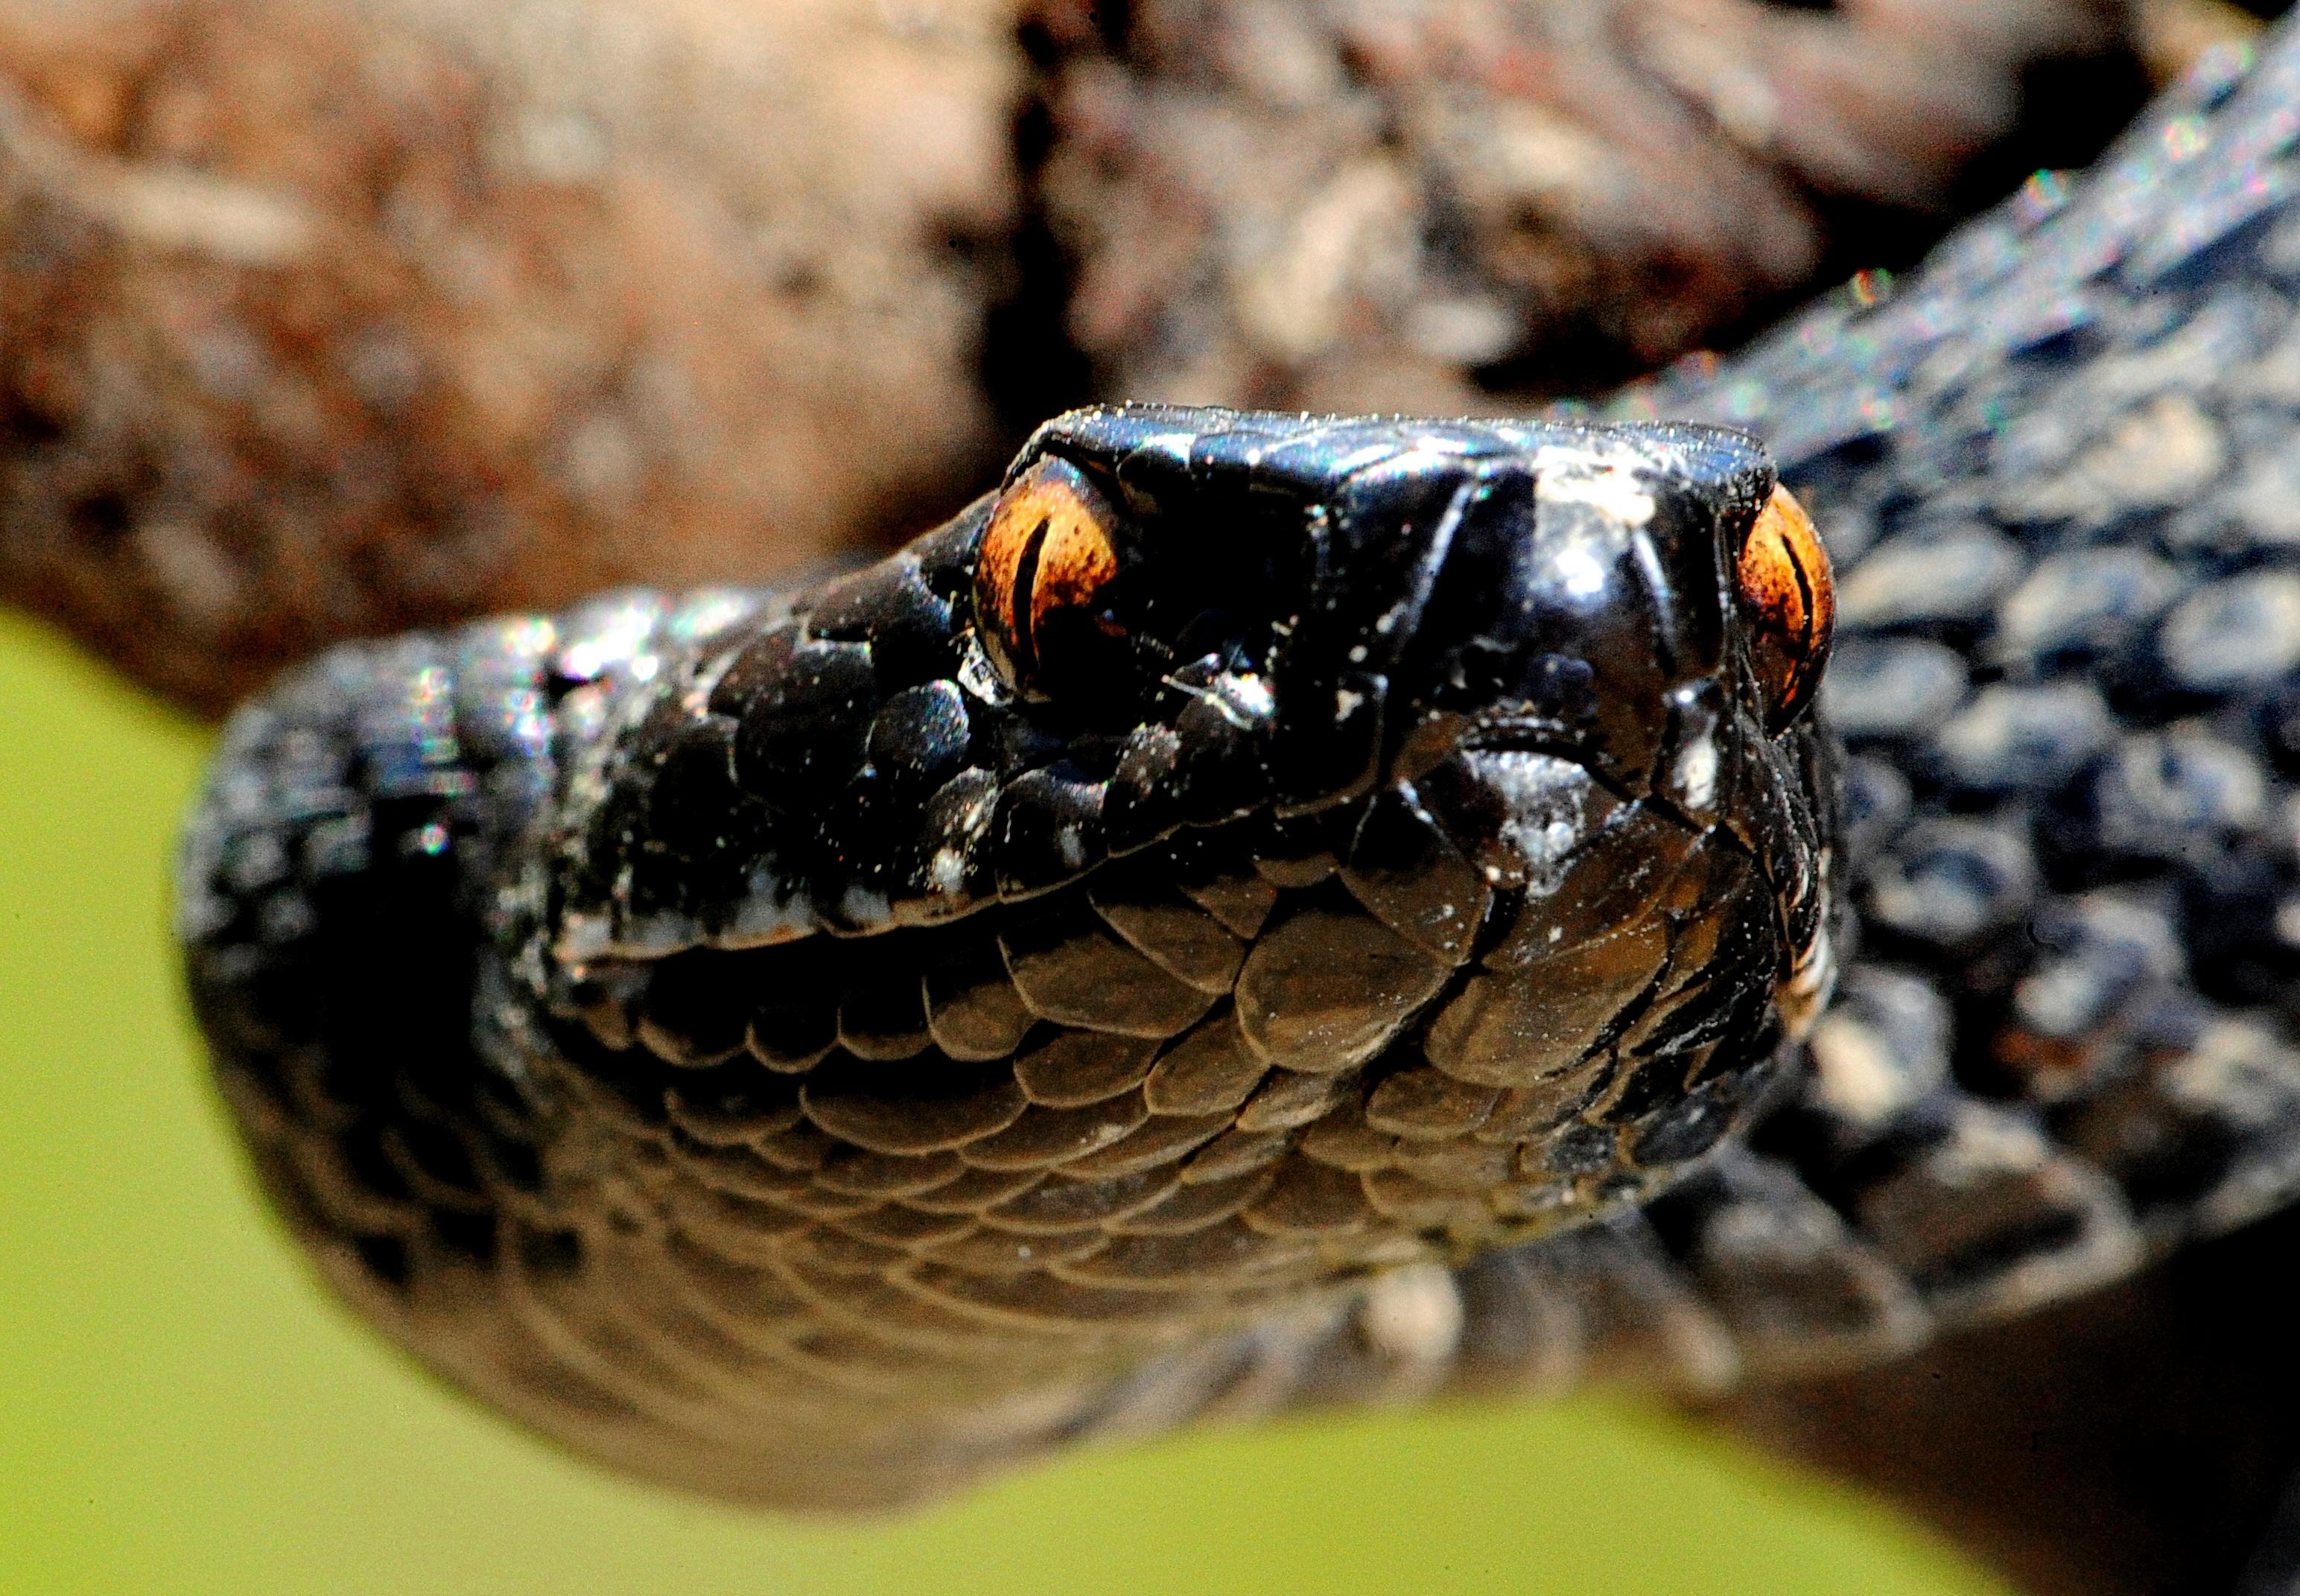 Curios Fapte Copperhead Snake